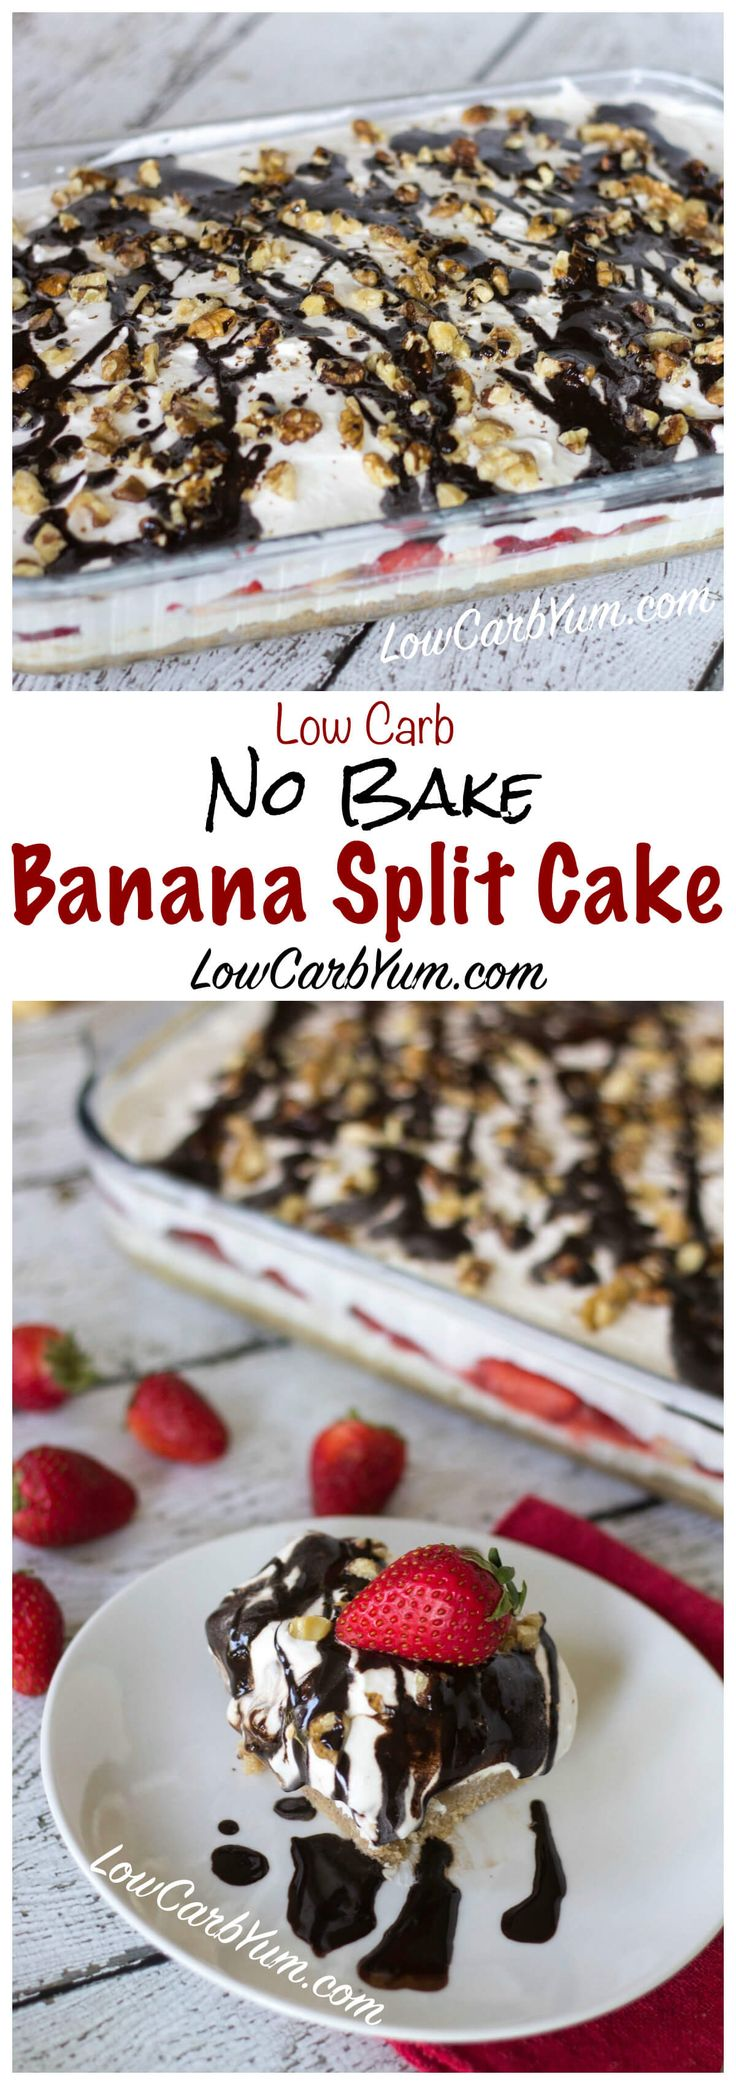 No Bake Banana Split Cake Cheesecake | Recipe | Gluten ...